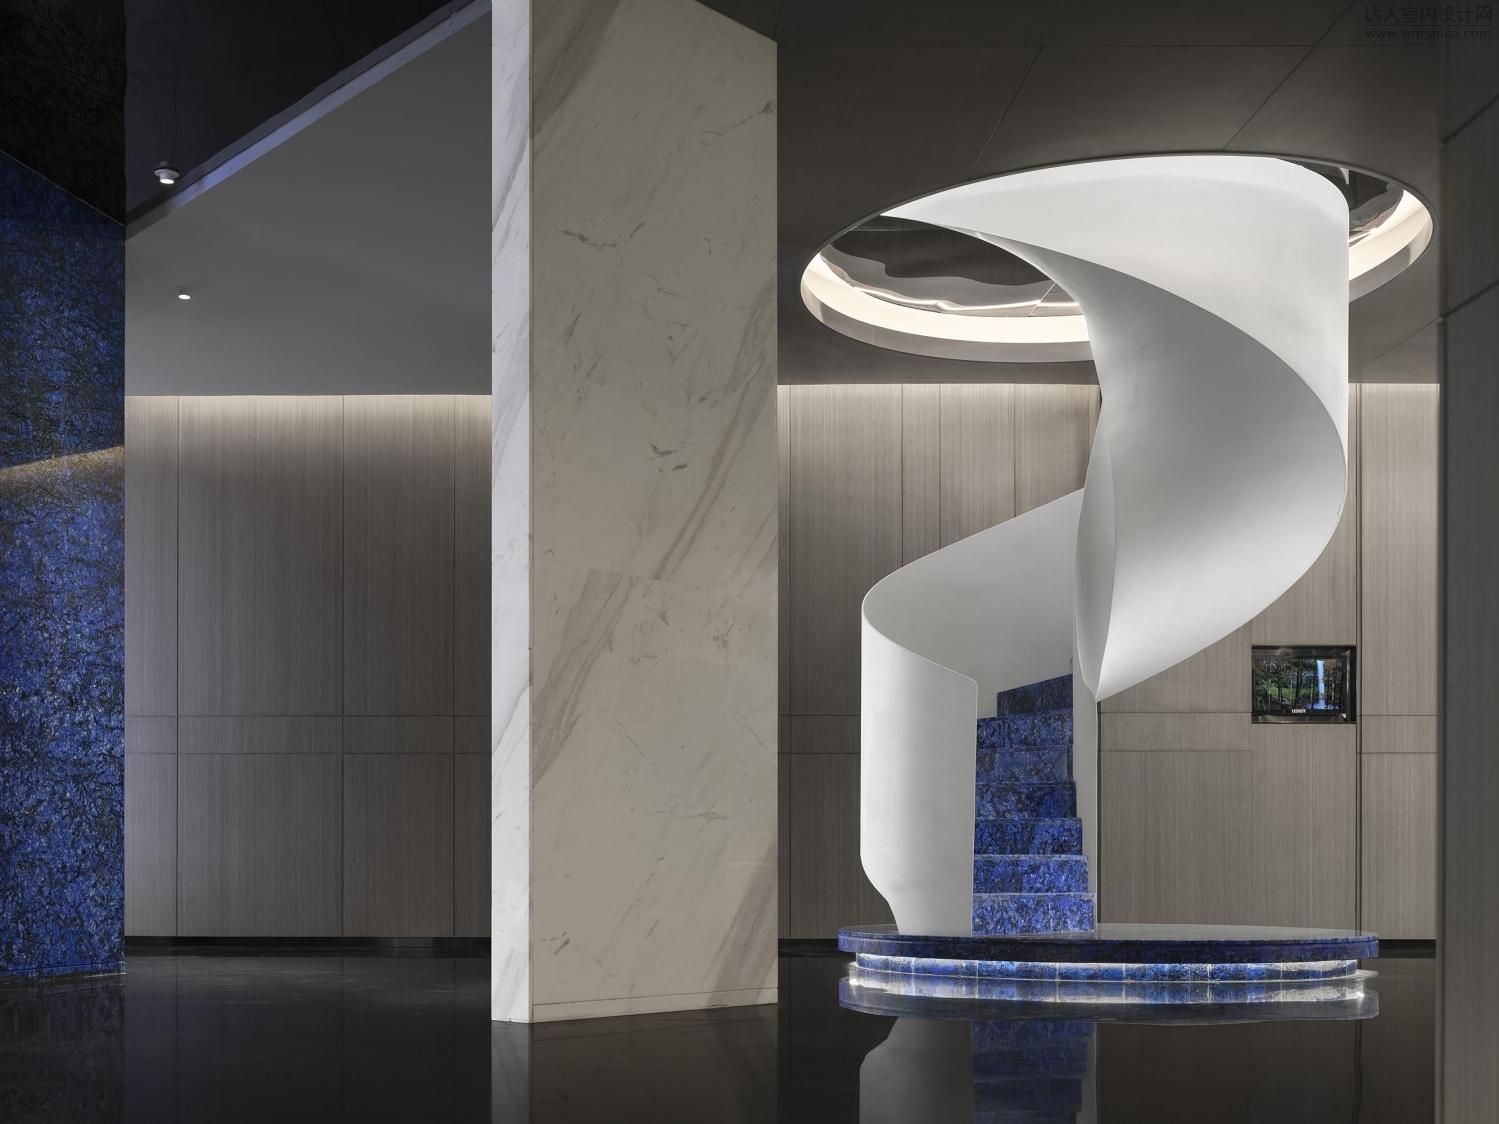 BDD布道设计--画宅 生活家装饰集团 梵高别墅软装馆